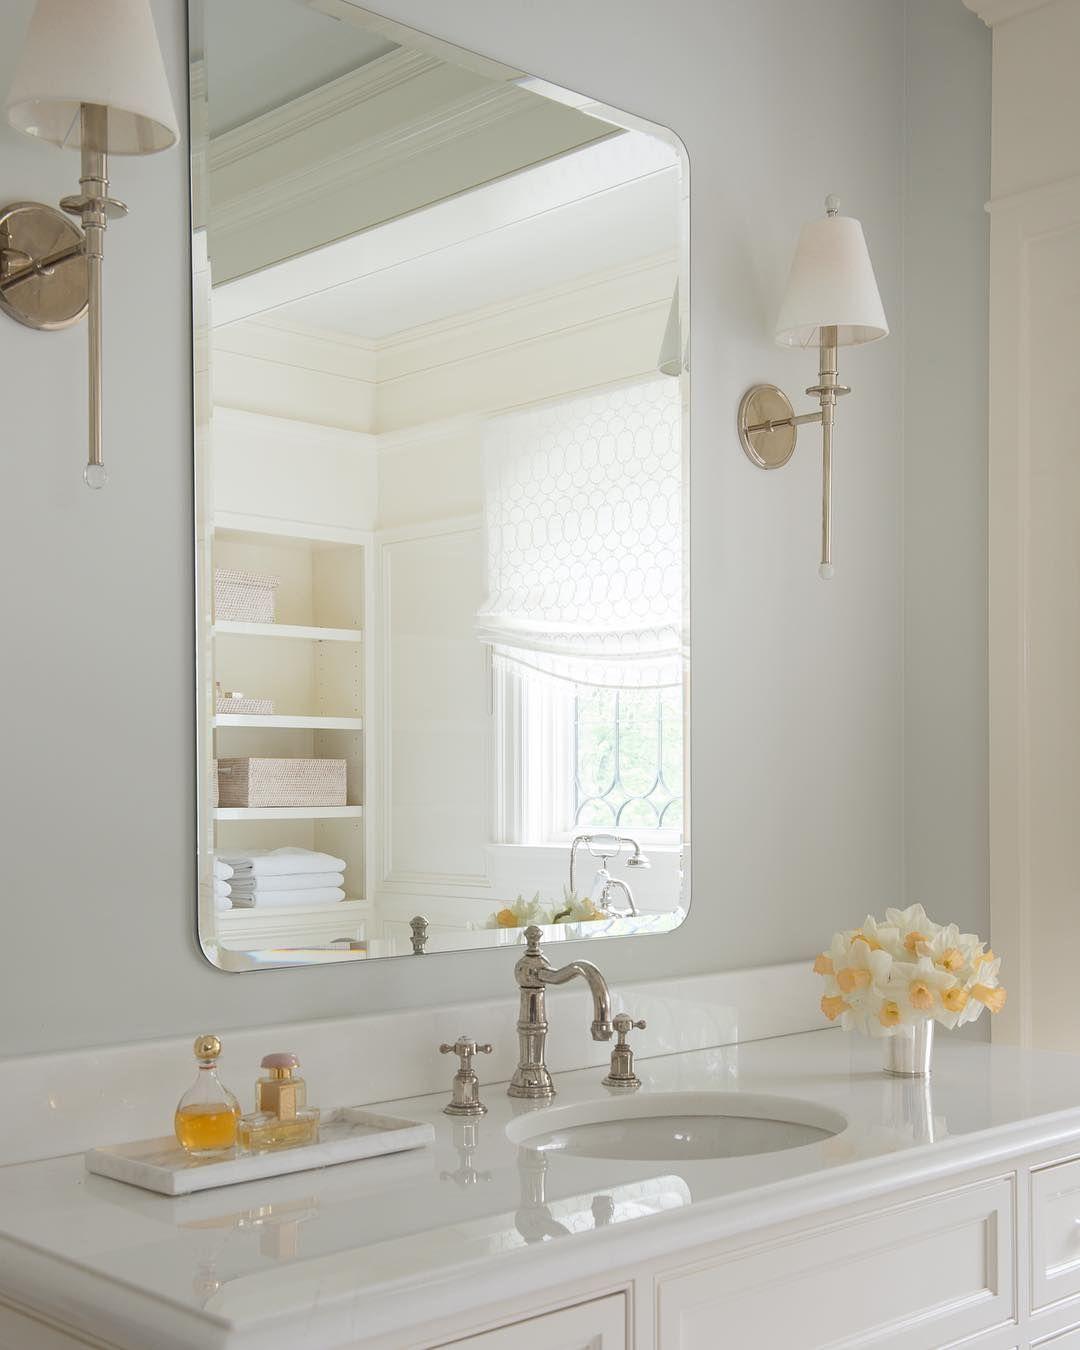 Jane Beiles Photography + Douglas Graneto Design - White bathroom ...